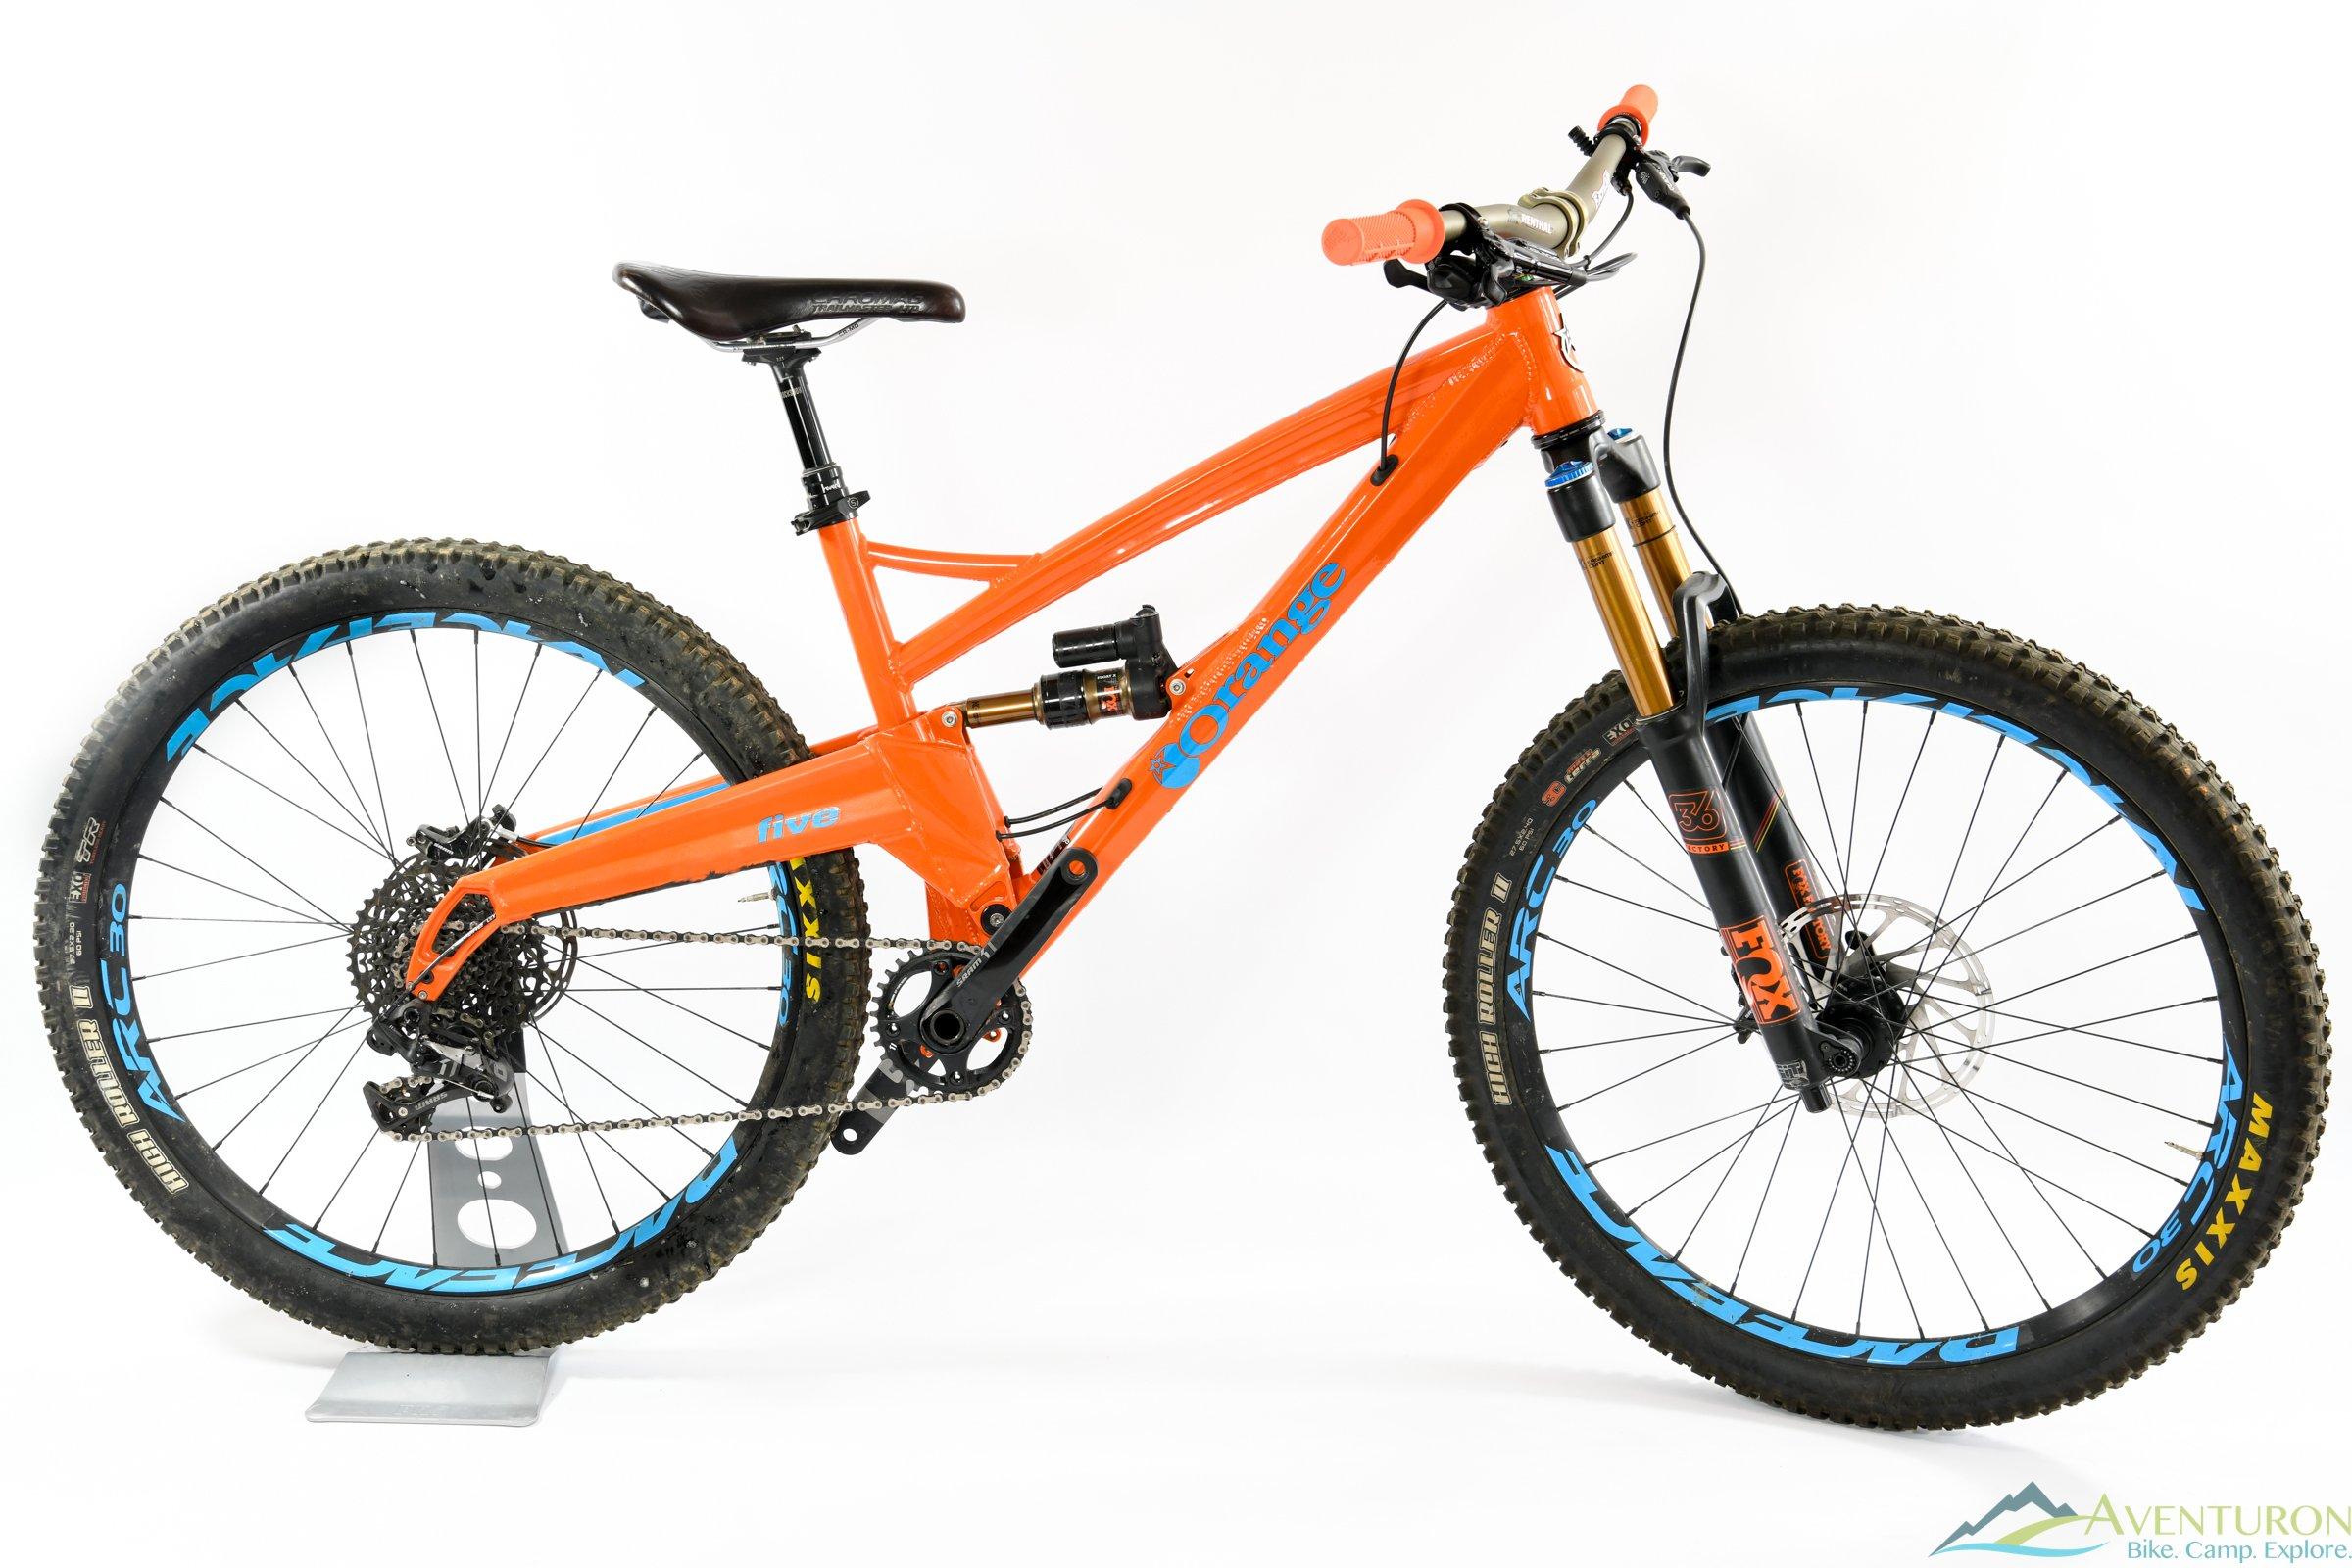 2017 Orange Bikes Five RS w/upgrades demo bike - size Medium – Aventuron